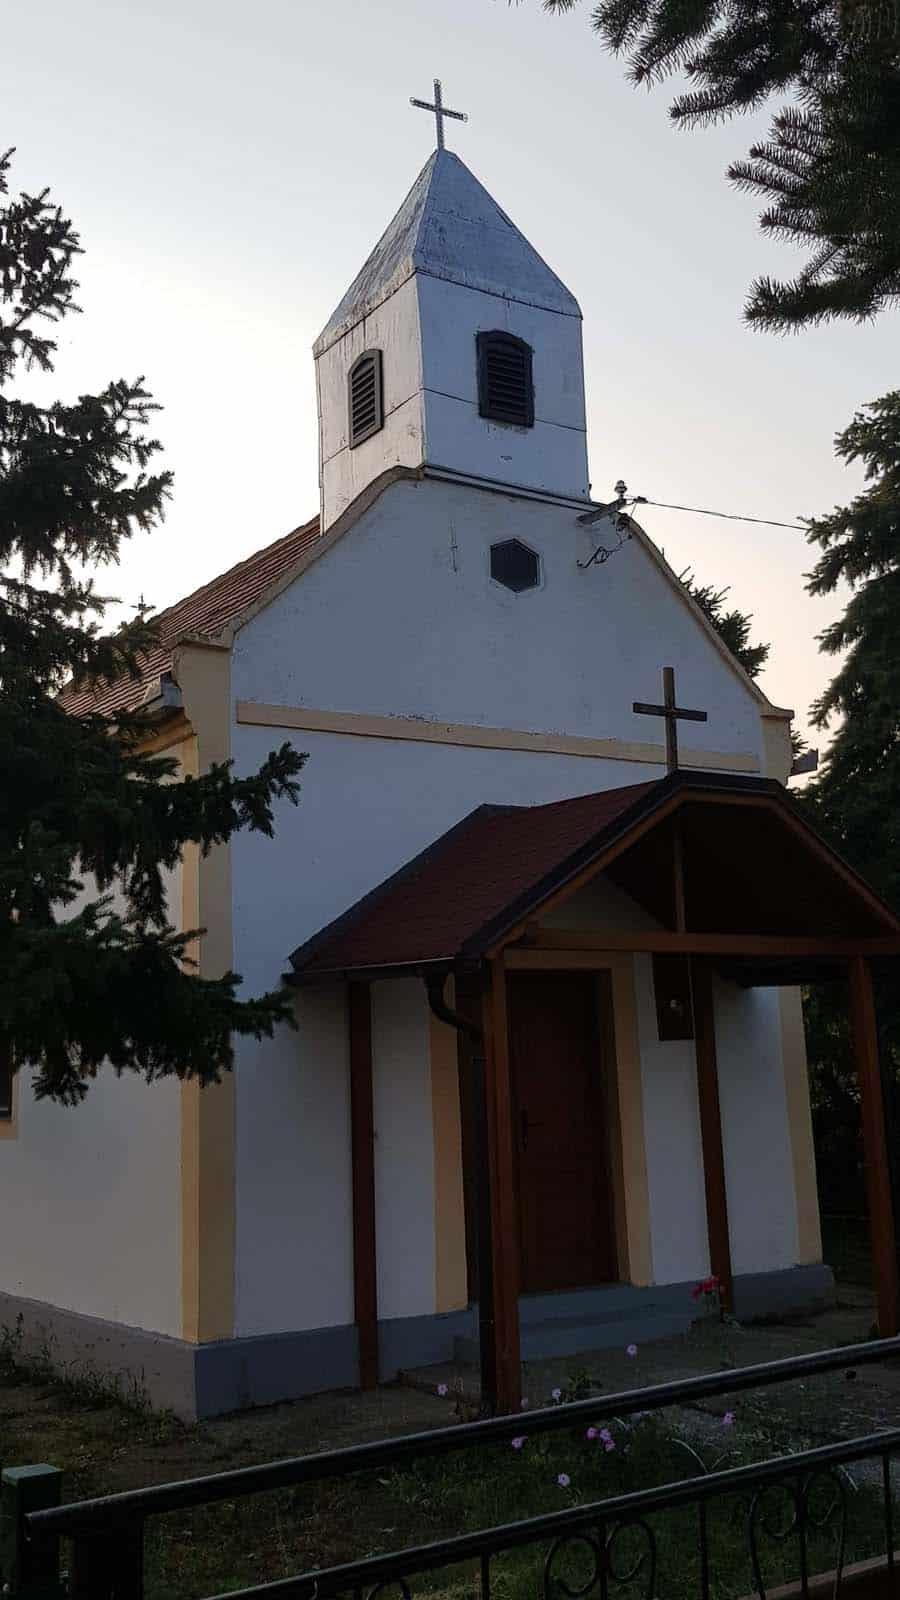 Crkva na kraju sela: Dobrodol